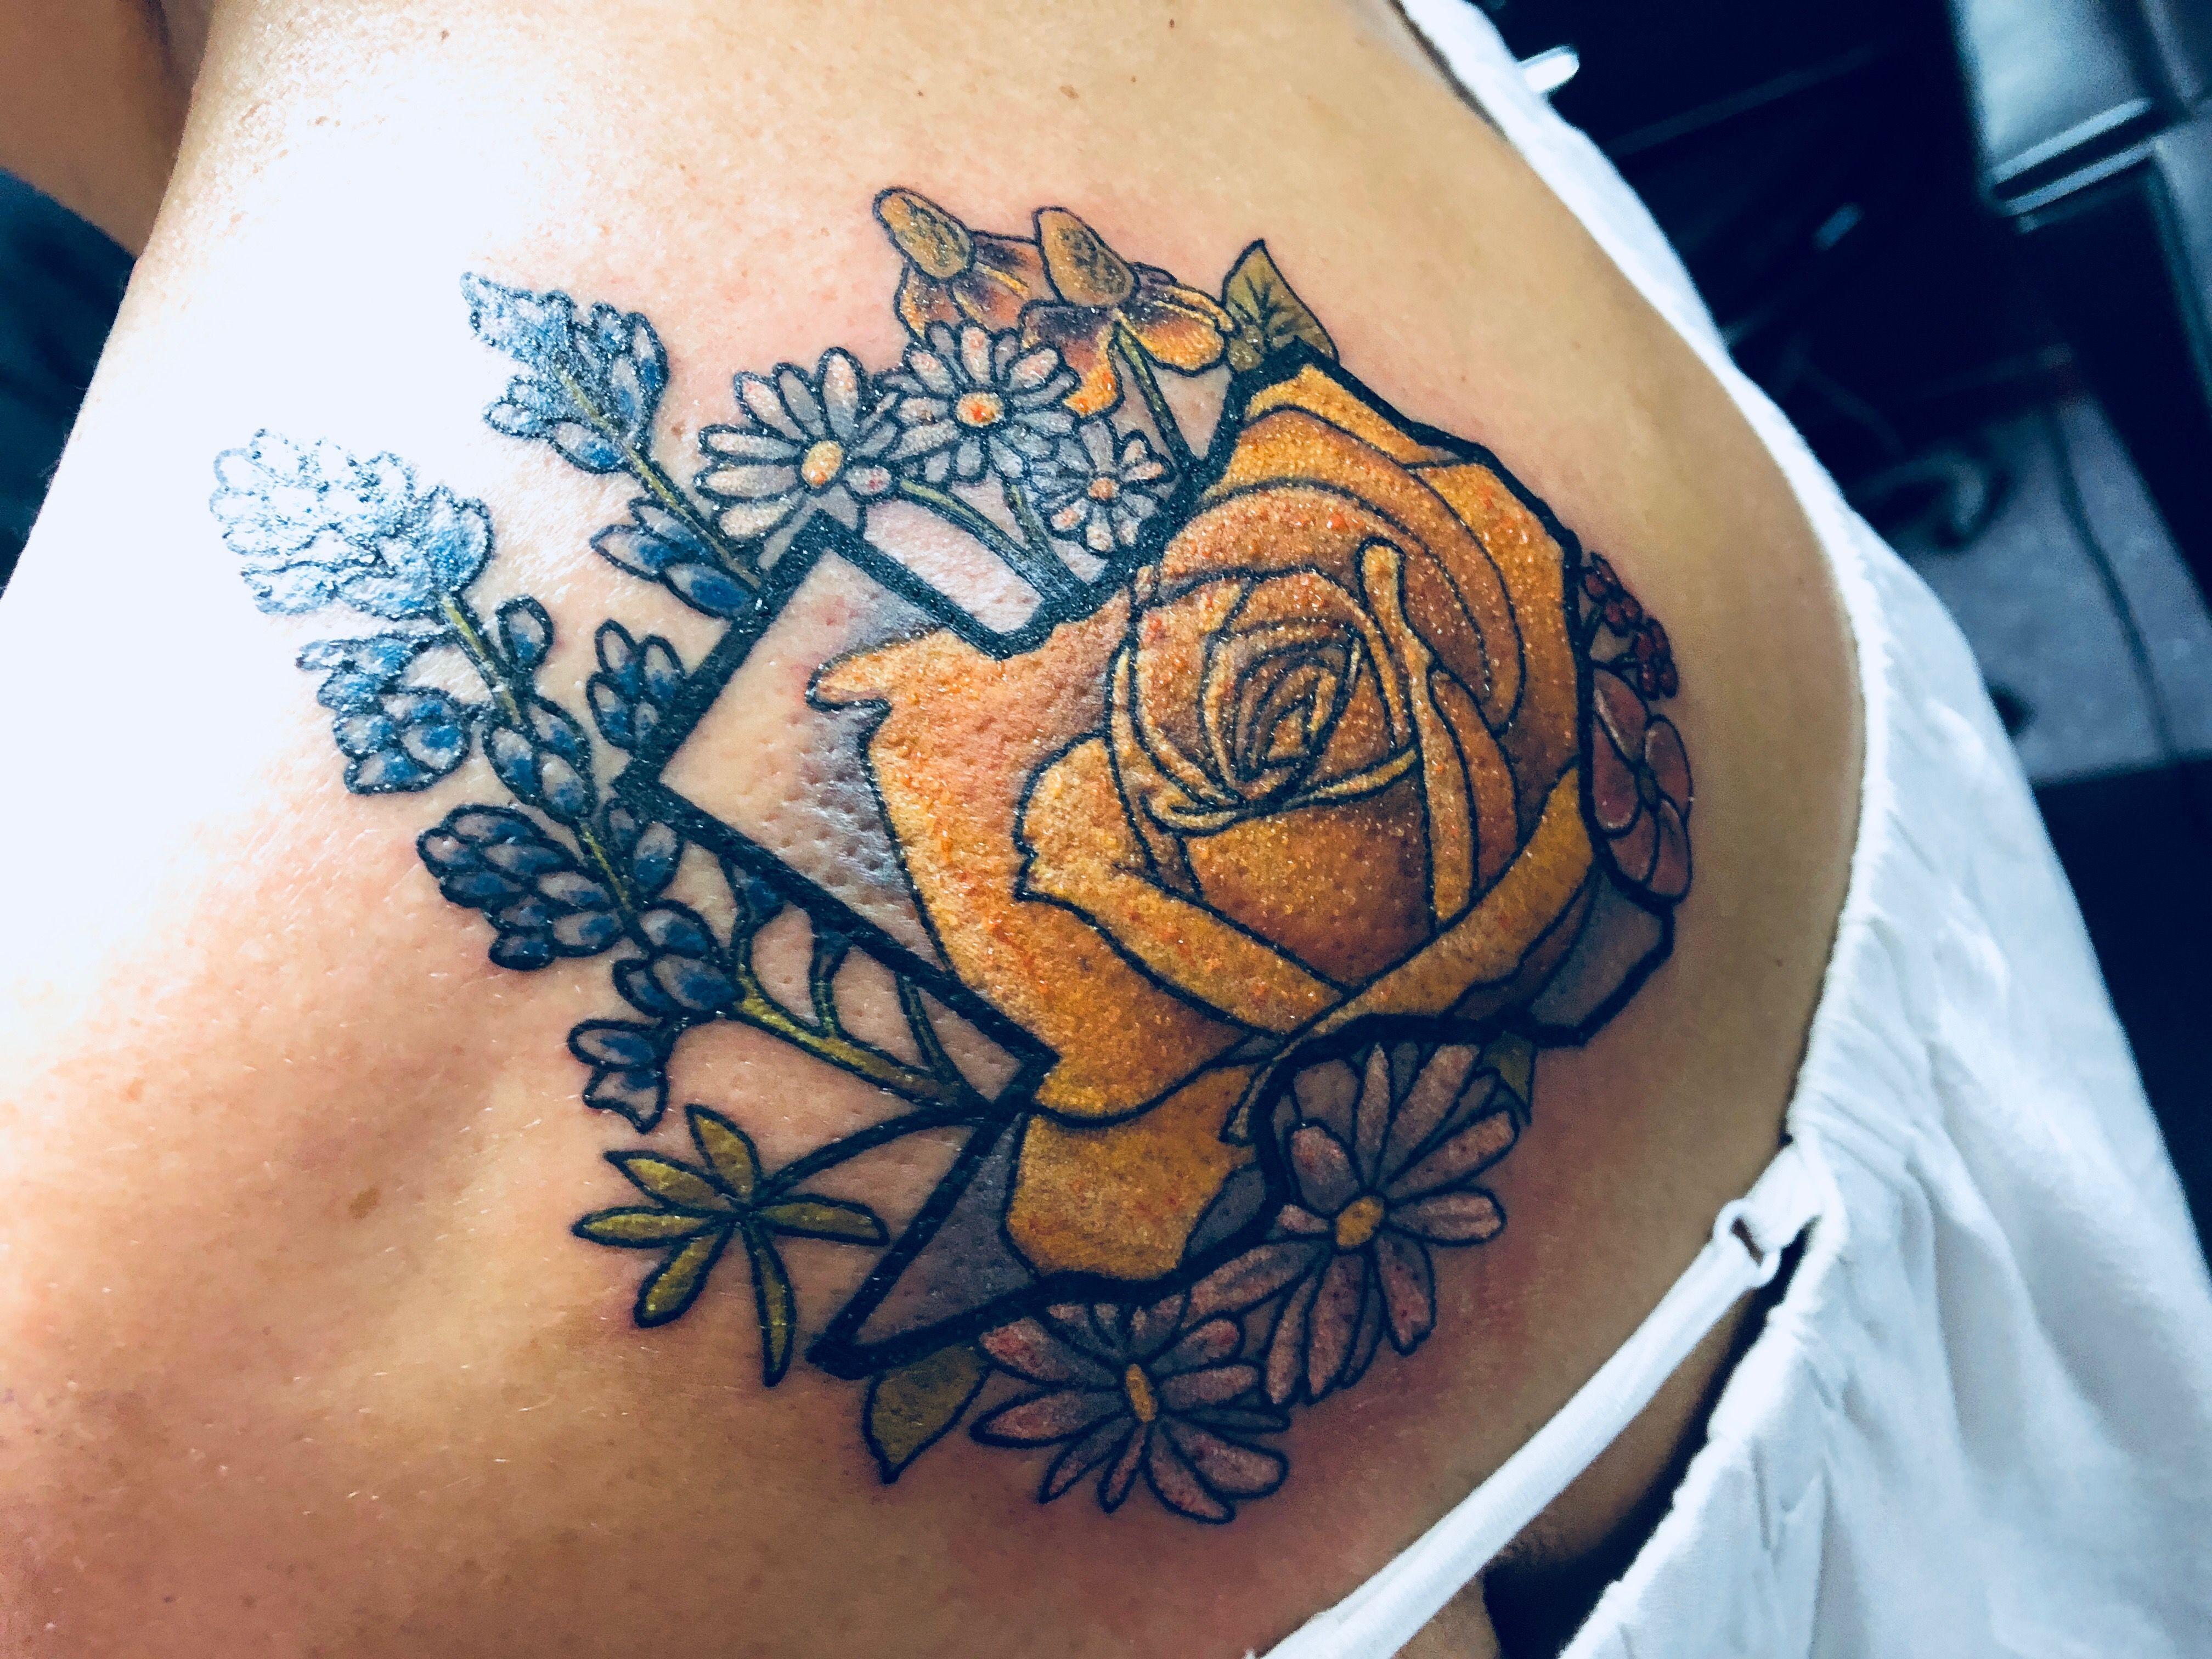 Yellow Rose Of Texas Tattoo Tattoo Yellowroseoftexastattoo Yellowrose Bluebonnettattoo Texas Texasforever Texas Tattoos Tattoos Cowgirl Tattoos